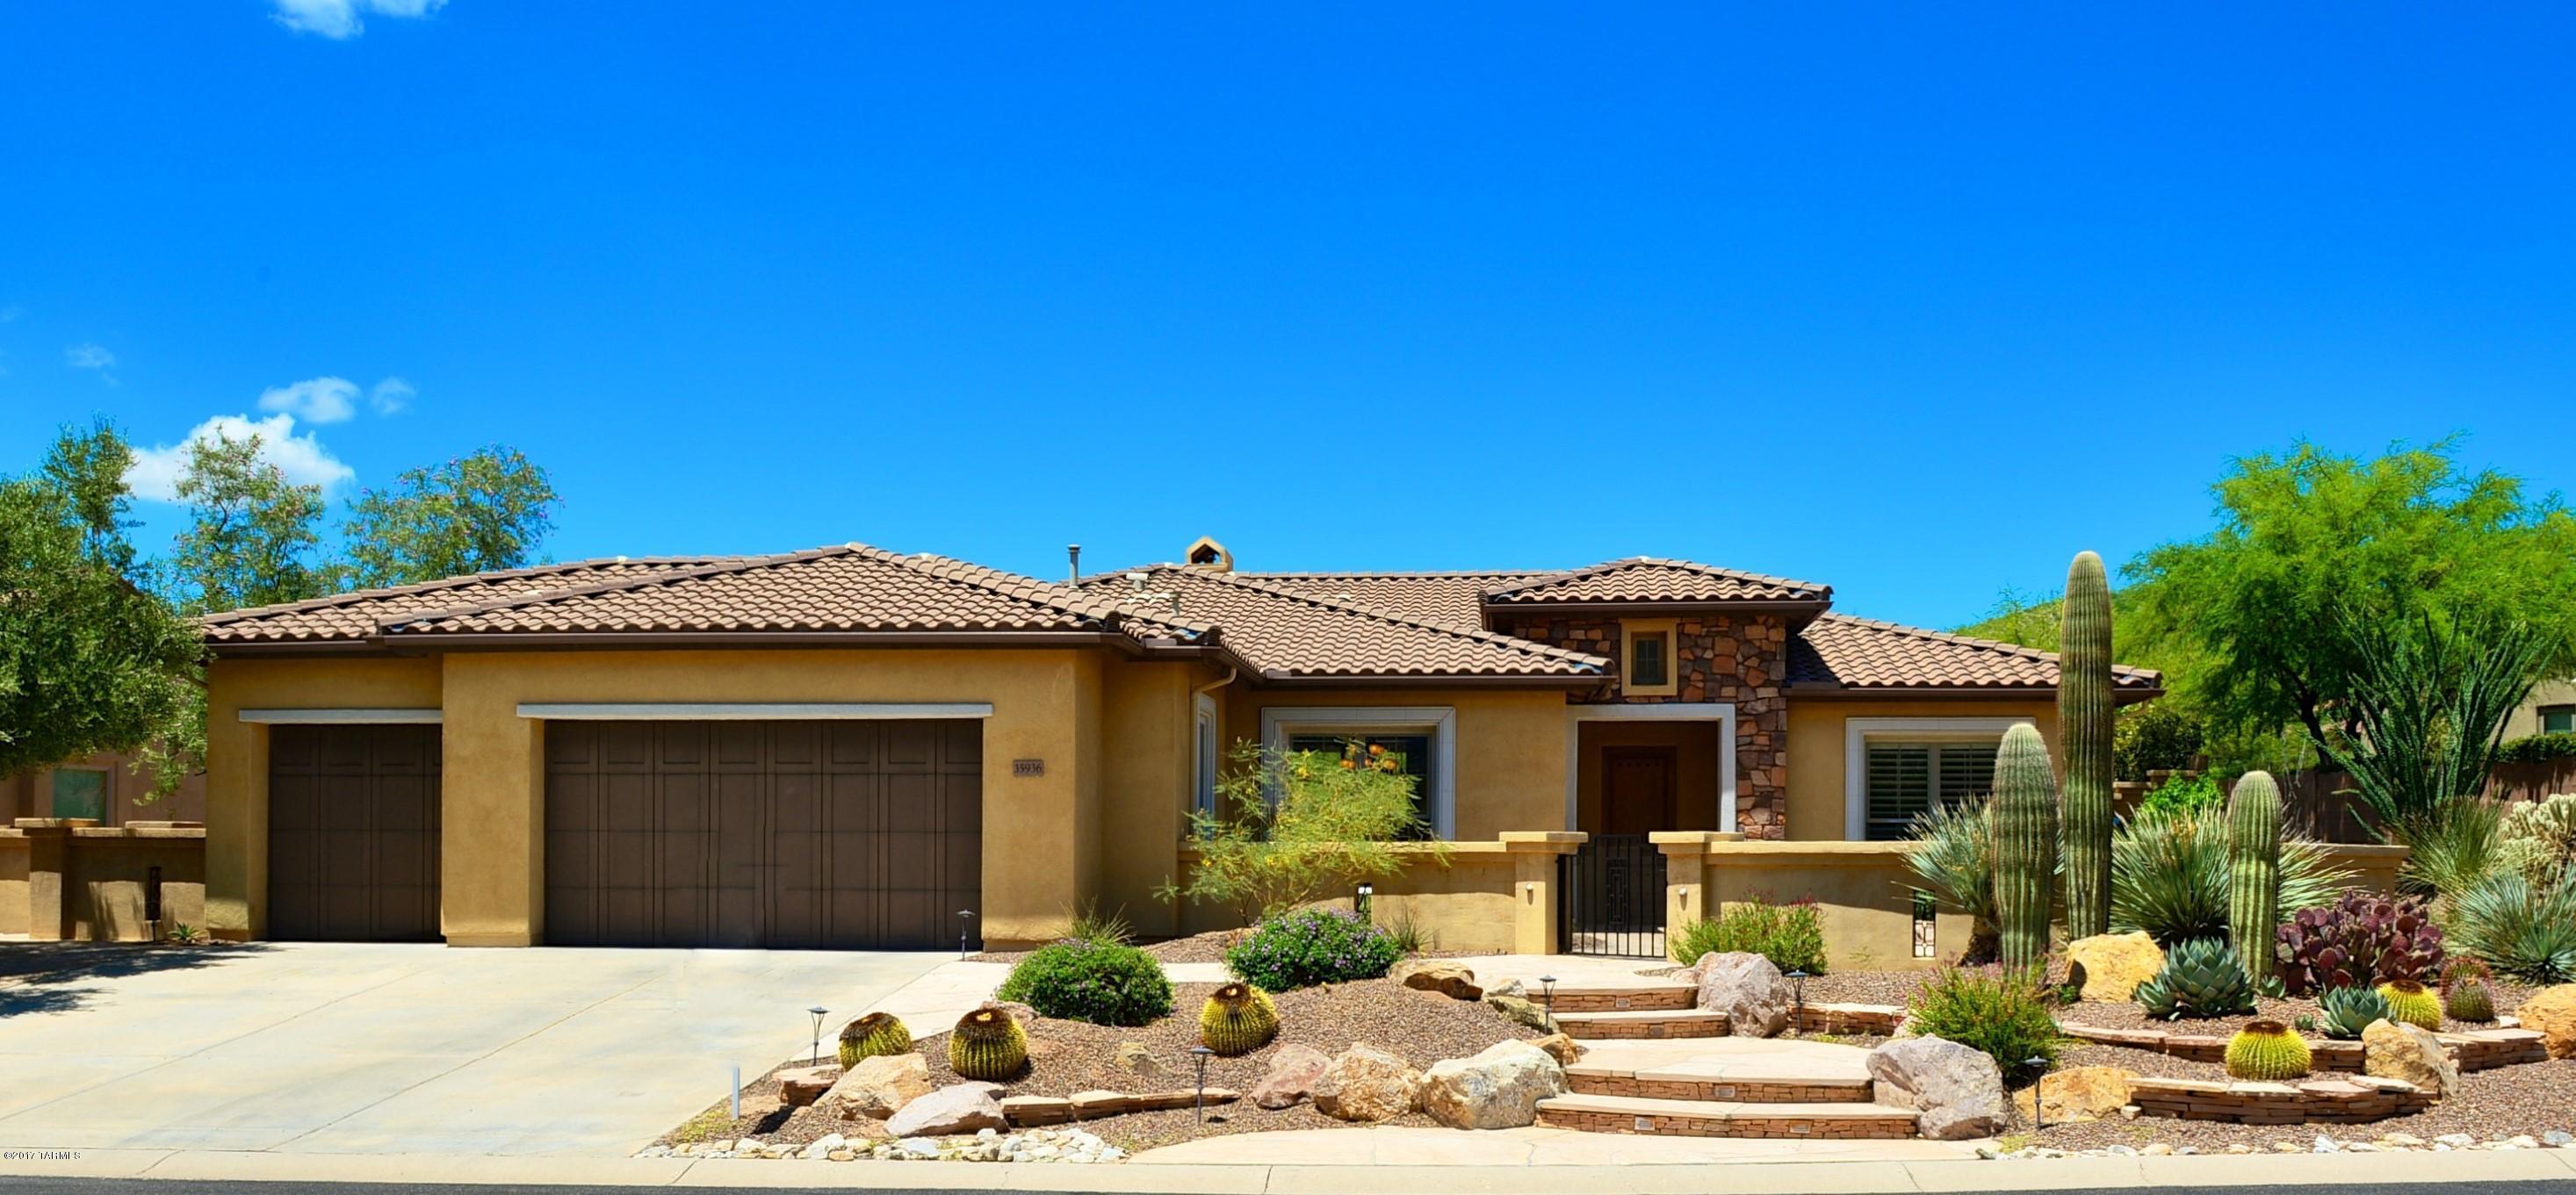 35936 S Ocotillo Canyon Drive, Tucson, AZ 85739